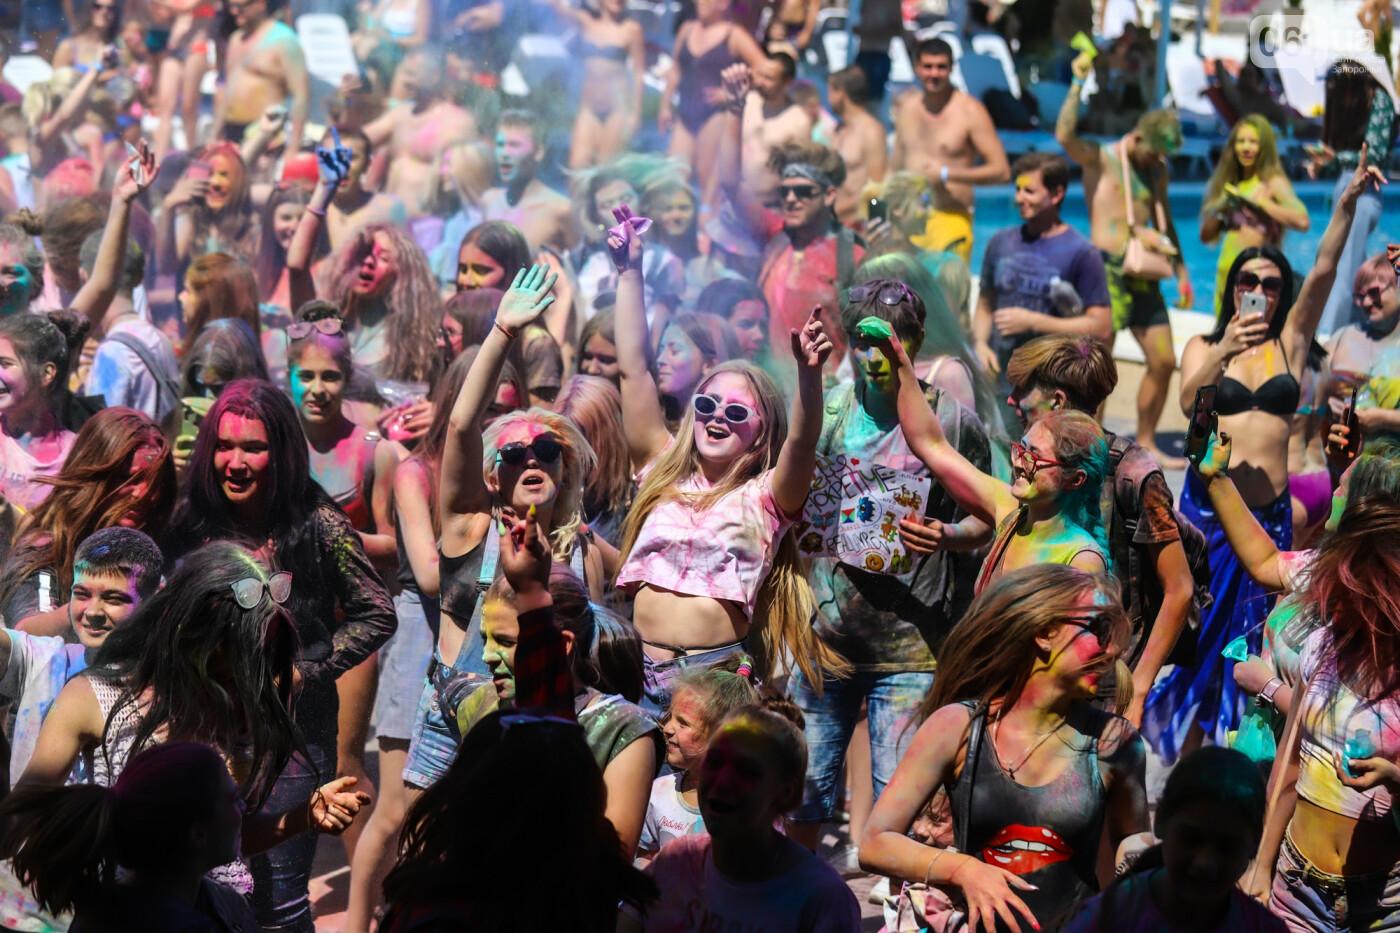 Сотни запорожцев приняли участие в фестивале красок Холи, - ФОТОРЕПОРТАЖ, фото-23